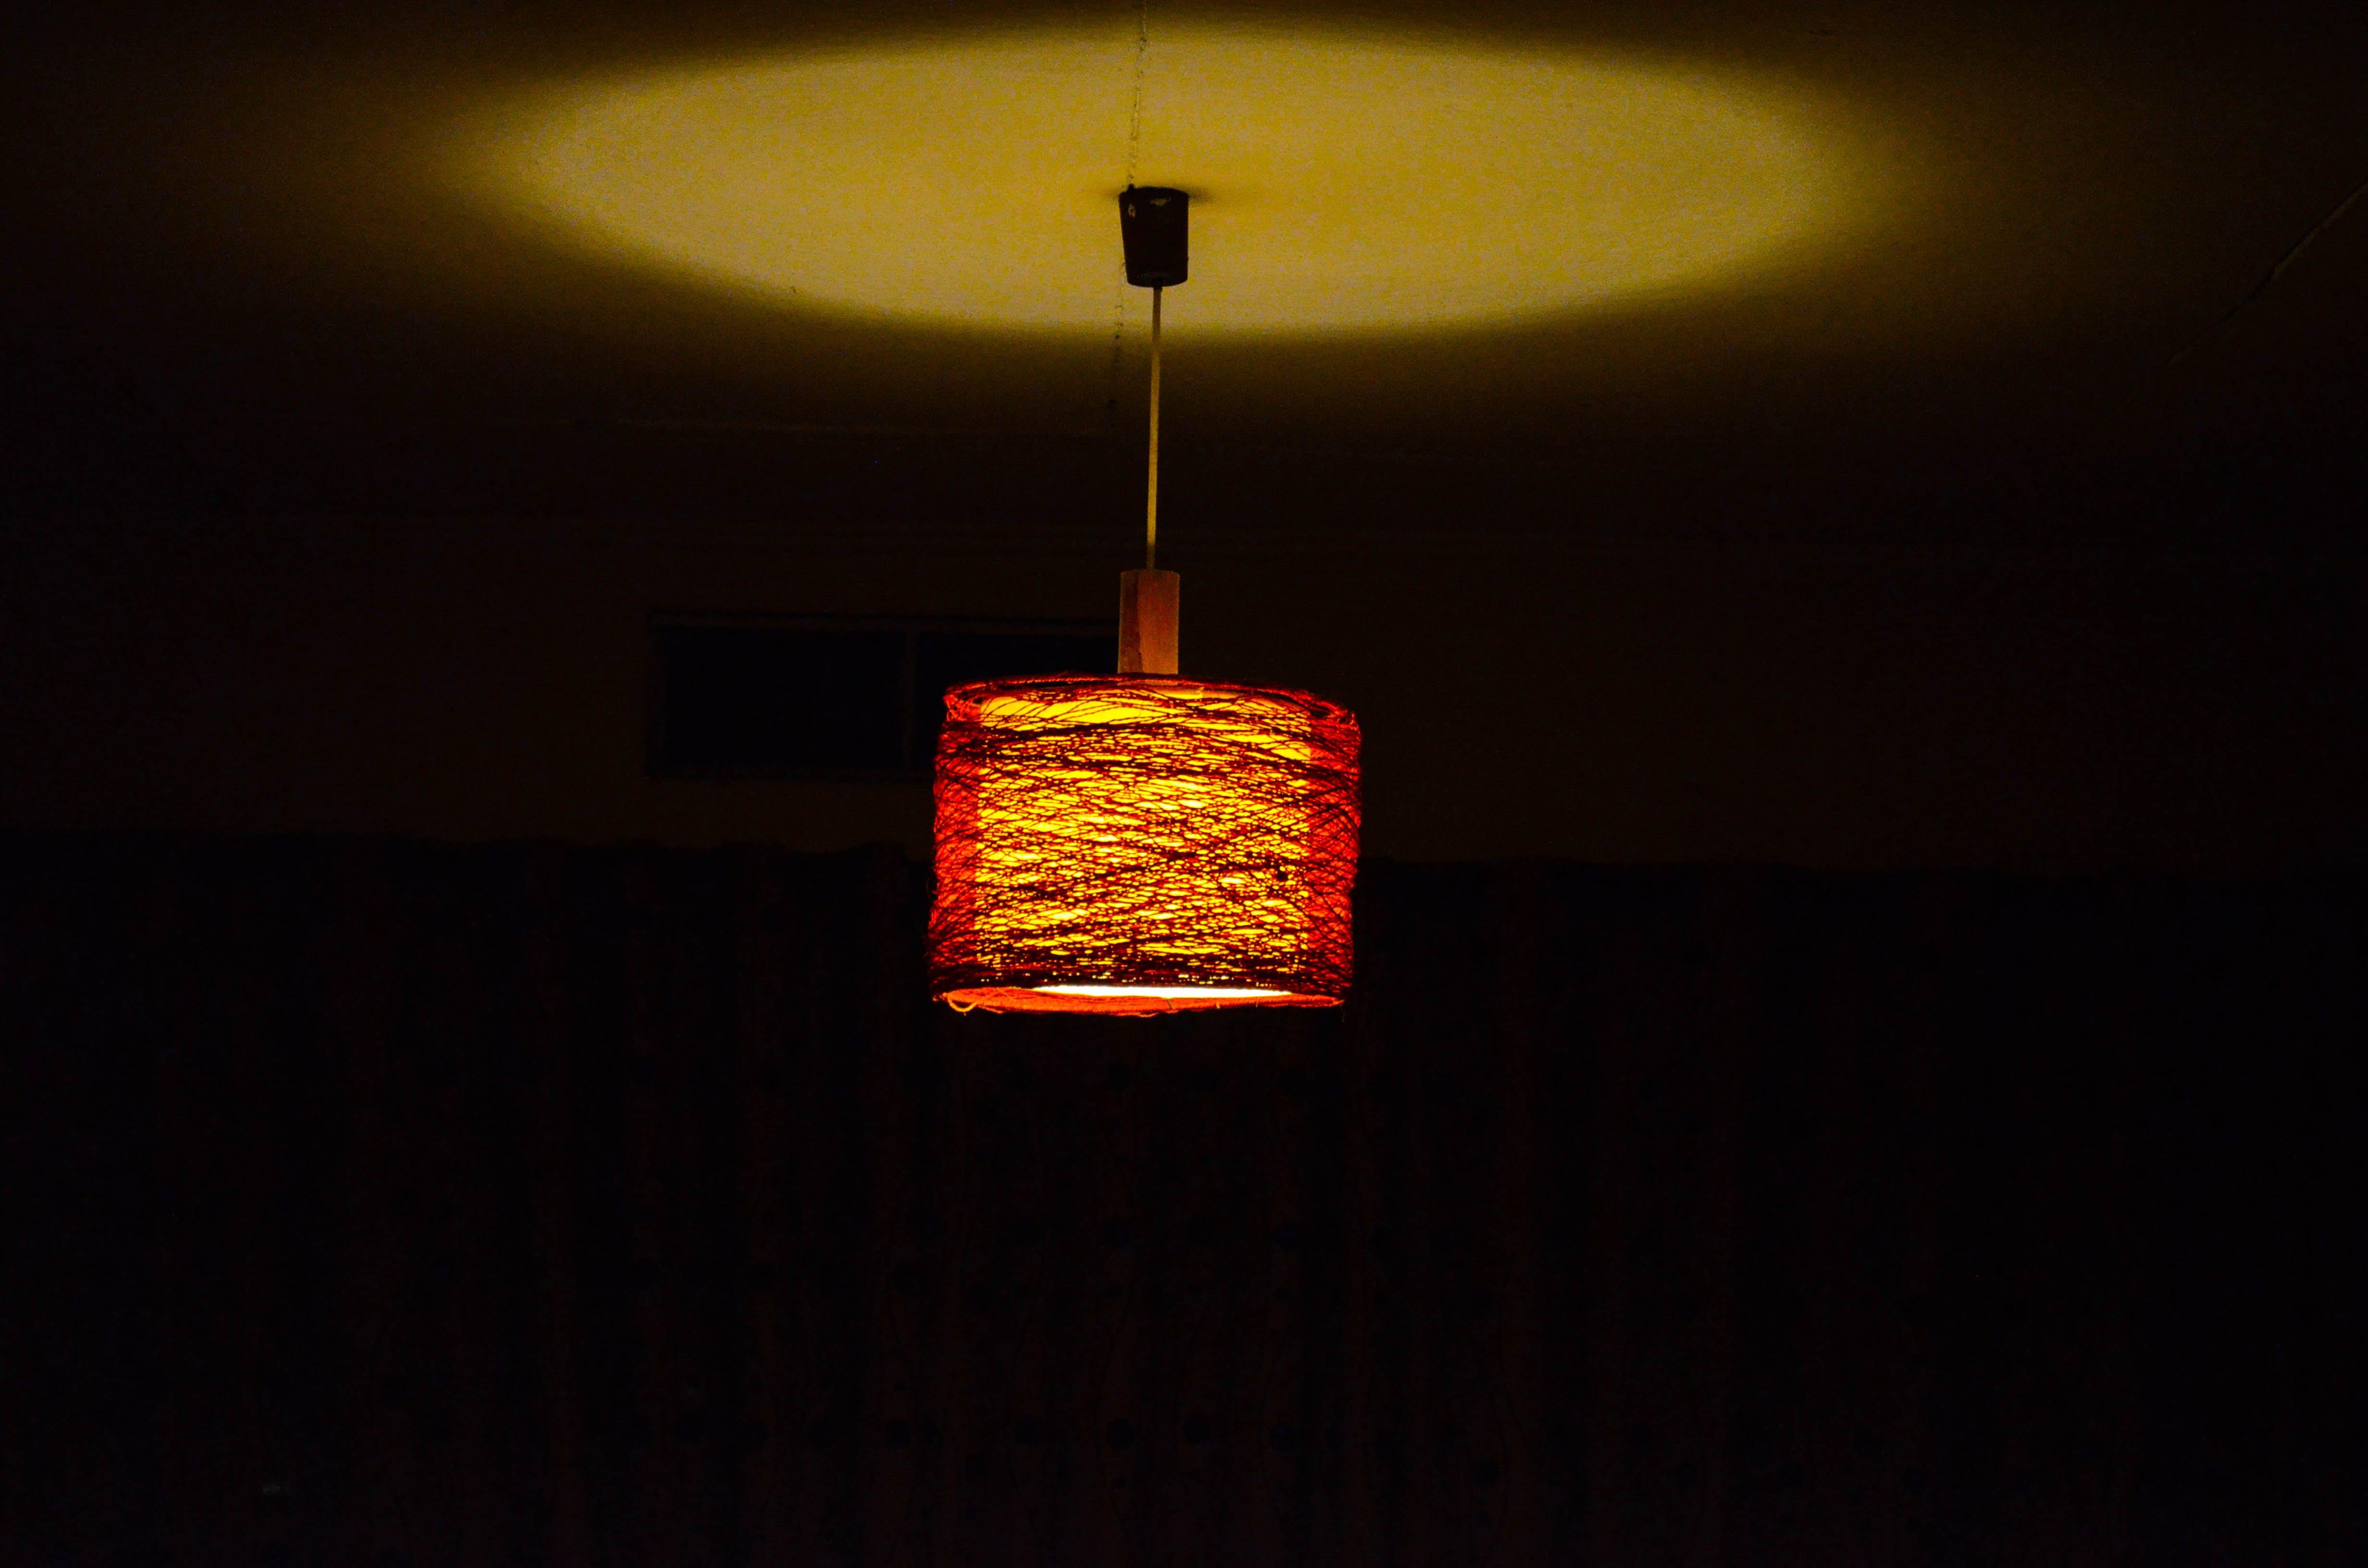 Free stock photo of ceiling, ceiling lamp, ceiling light, dark